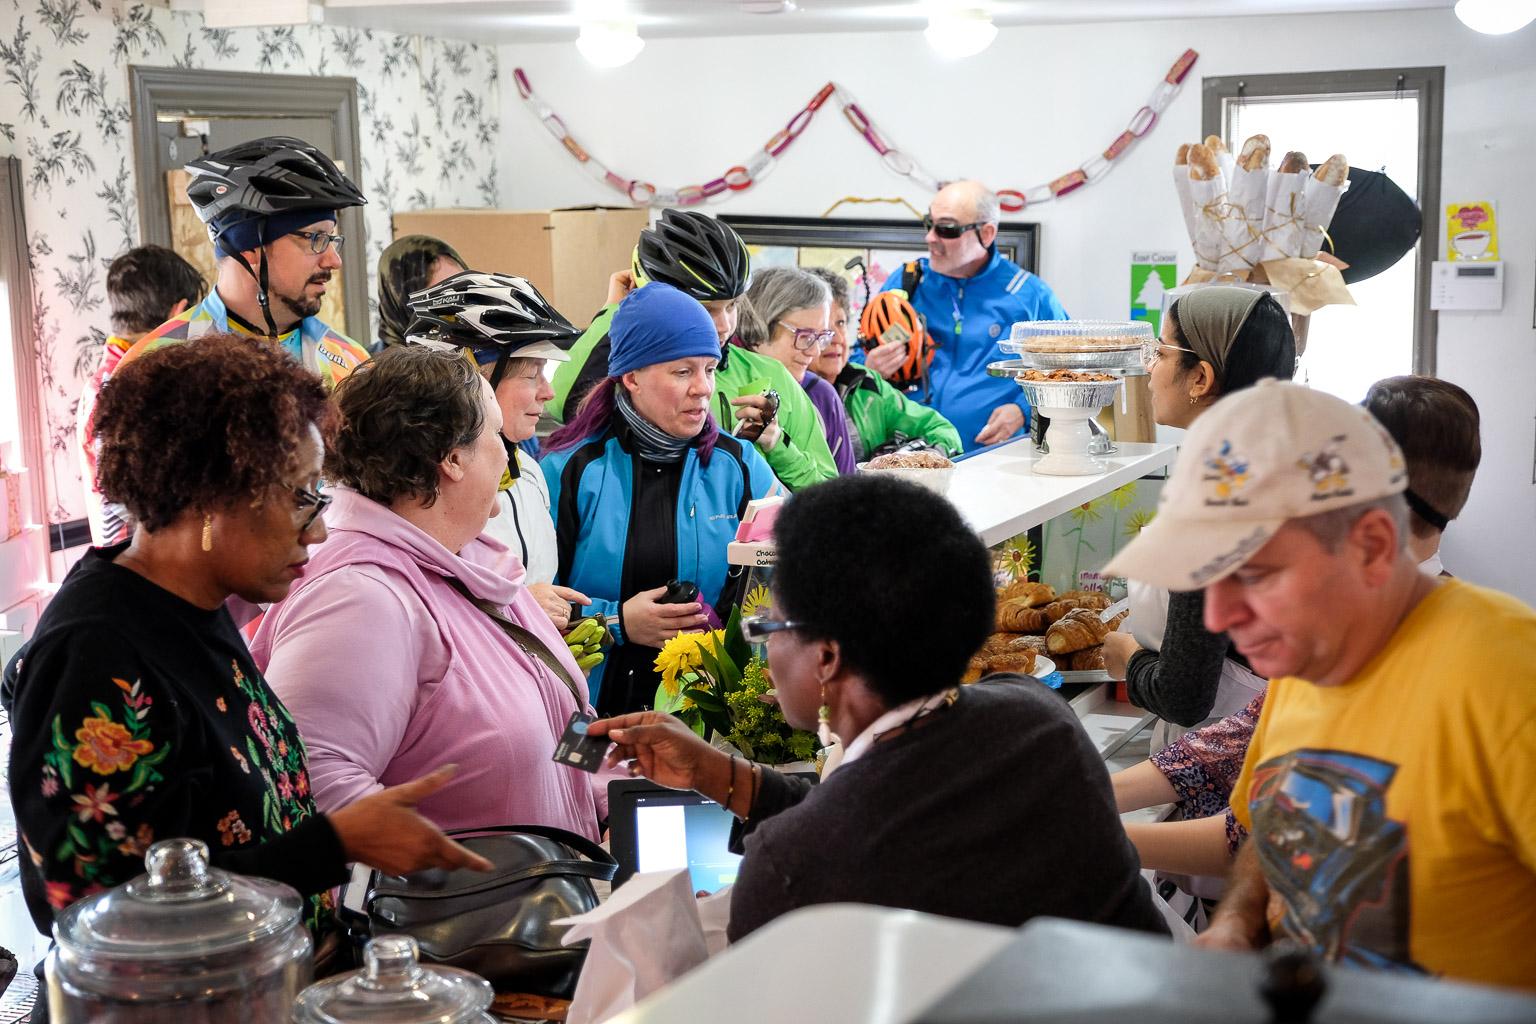 Shortcake_Reopening_11-18-17-014-Lenzy-Ruffin-Event-Photography-Washington-DC-Fuji-X-T2.jpg